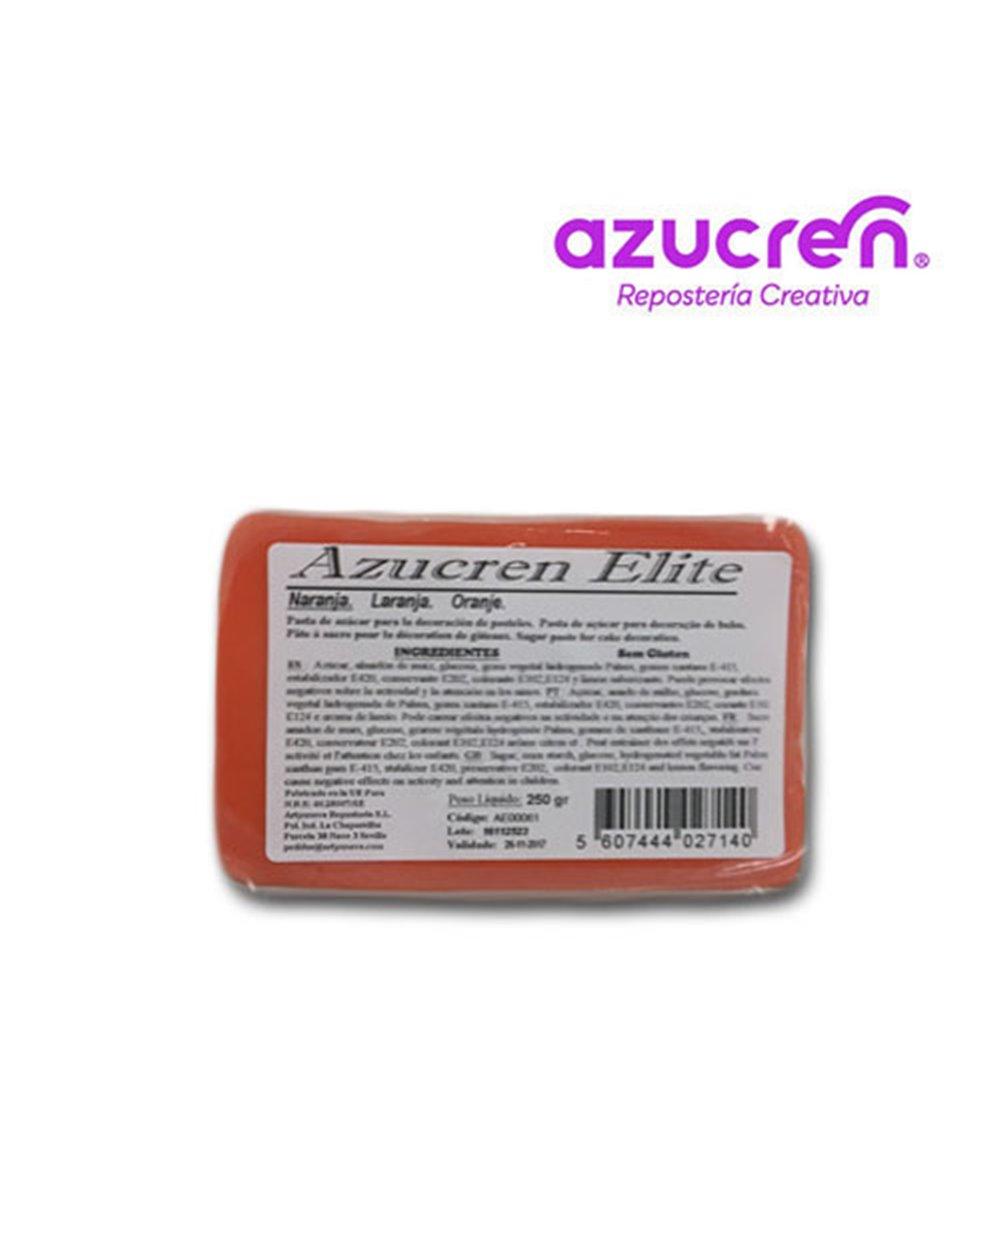 Azucren Naranja 250gr+